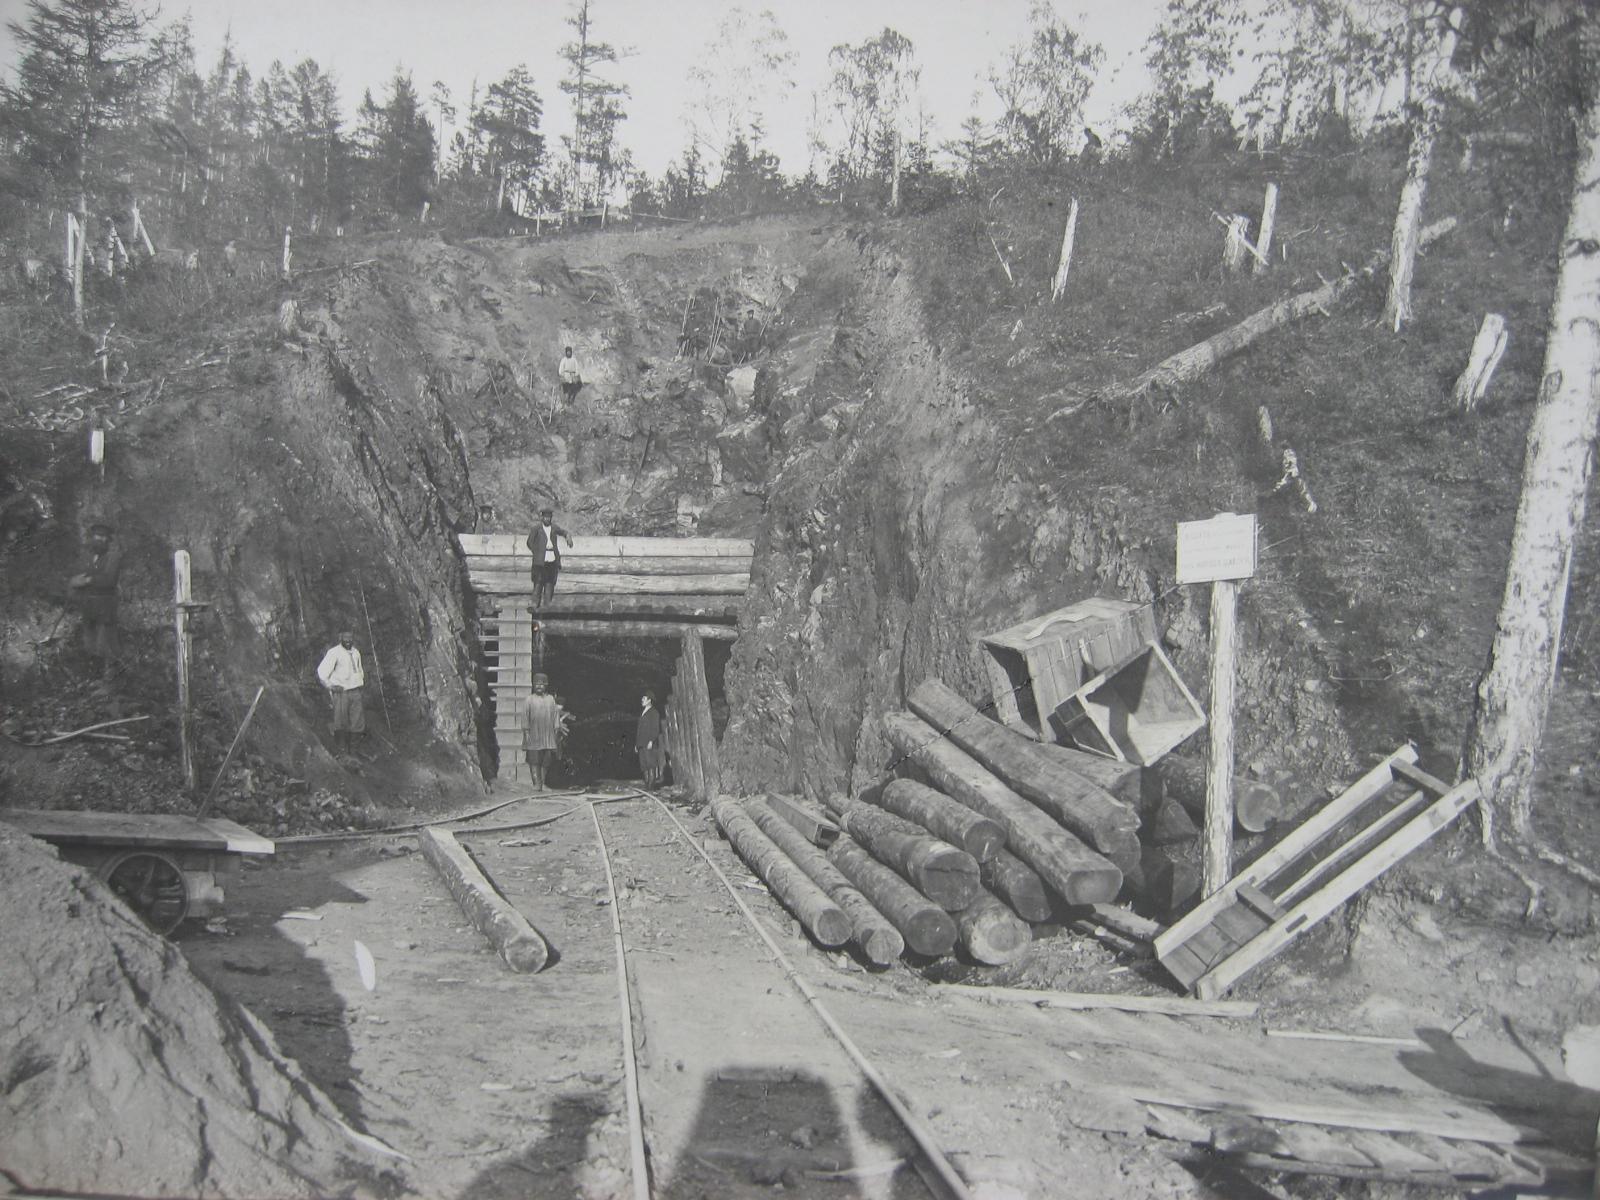 59. Пробивка тоннеля началась. Фото 1902 года.